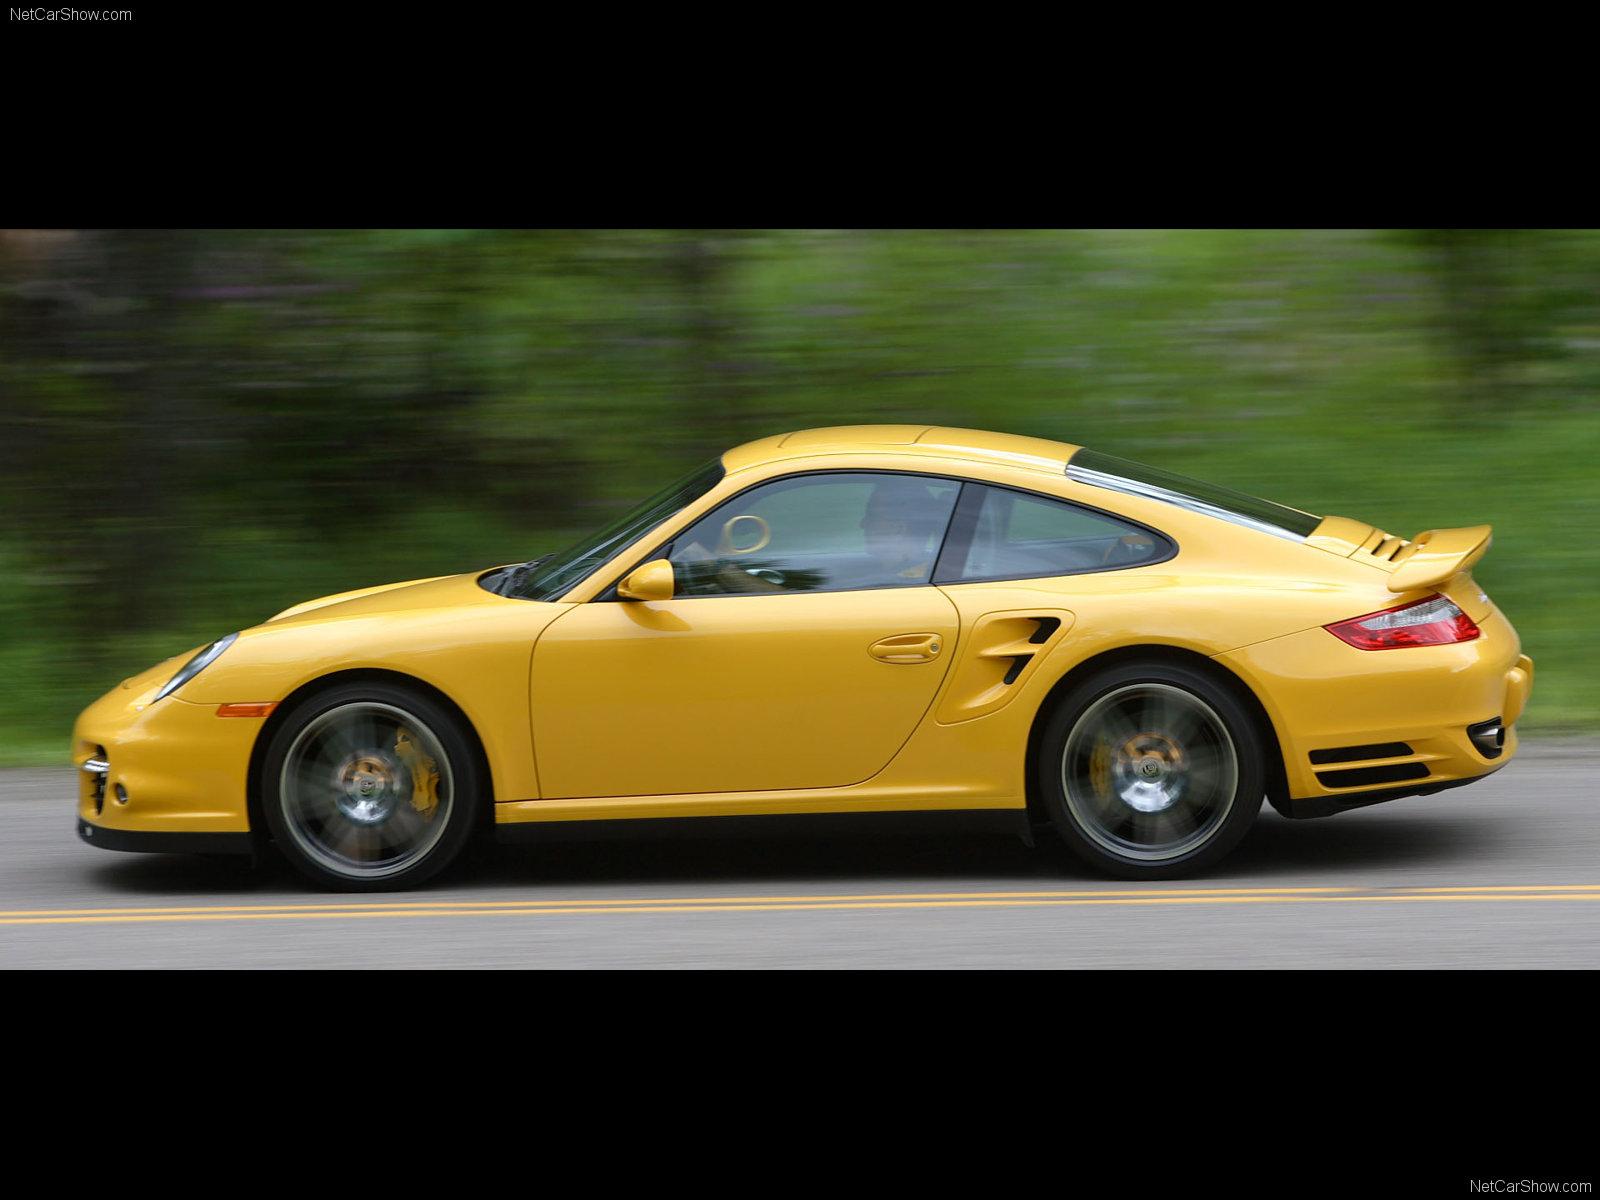 2007 Yellow Porsche 911 Turbo Wallpapers